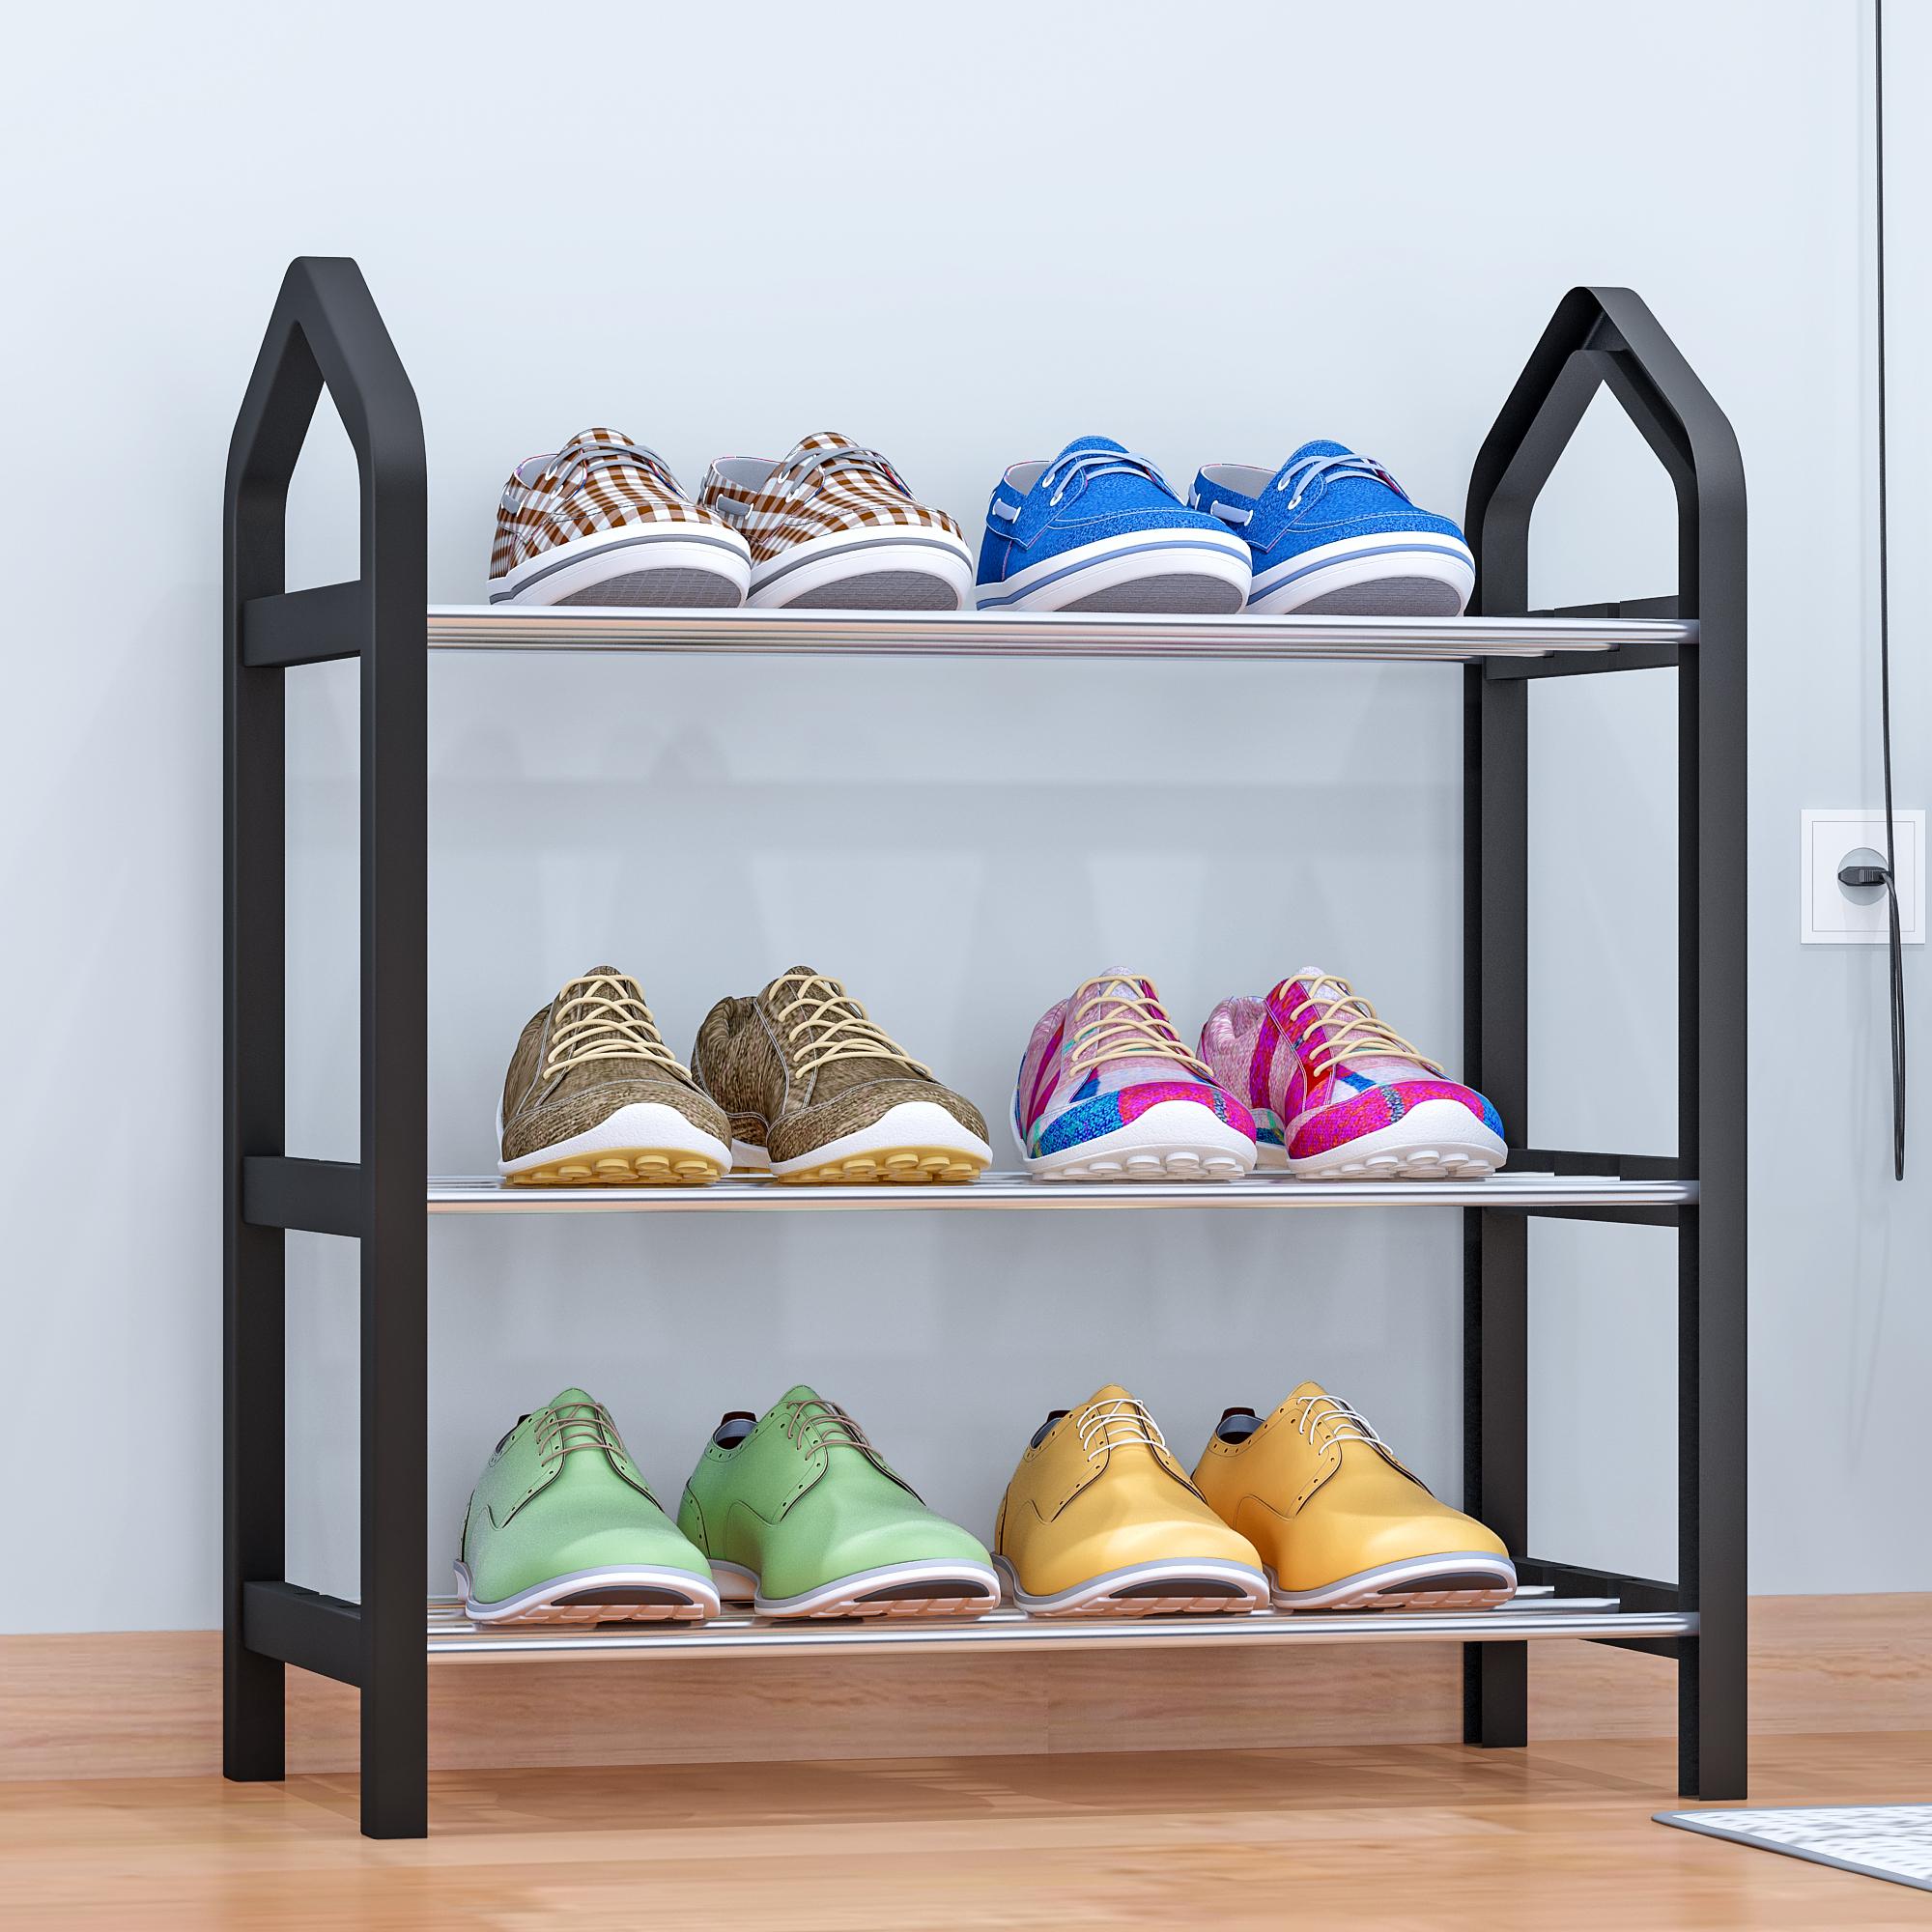 Wholesale diy shoe rack - Online Buy Best diy shoe rack from China ...